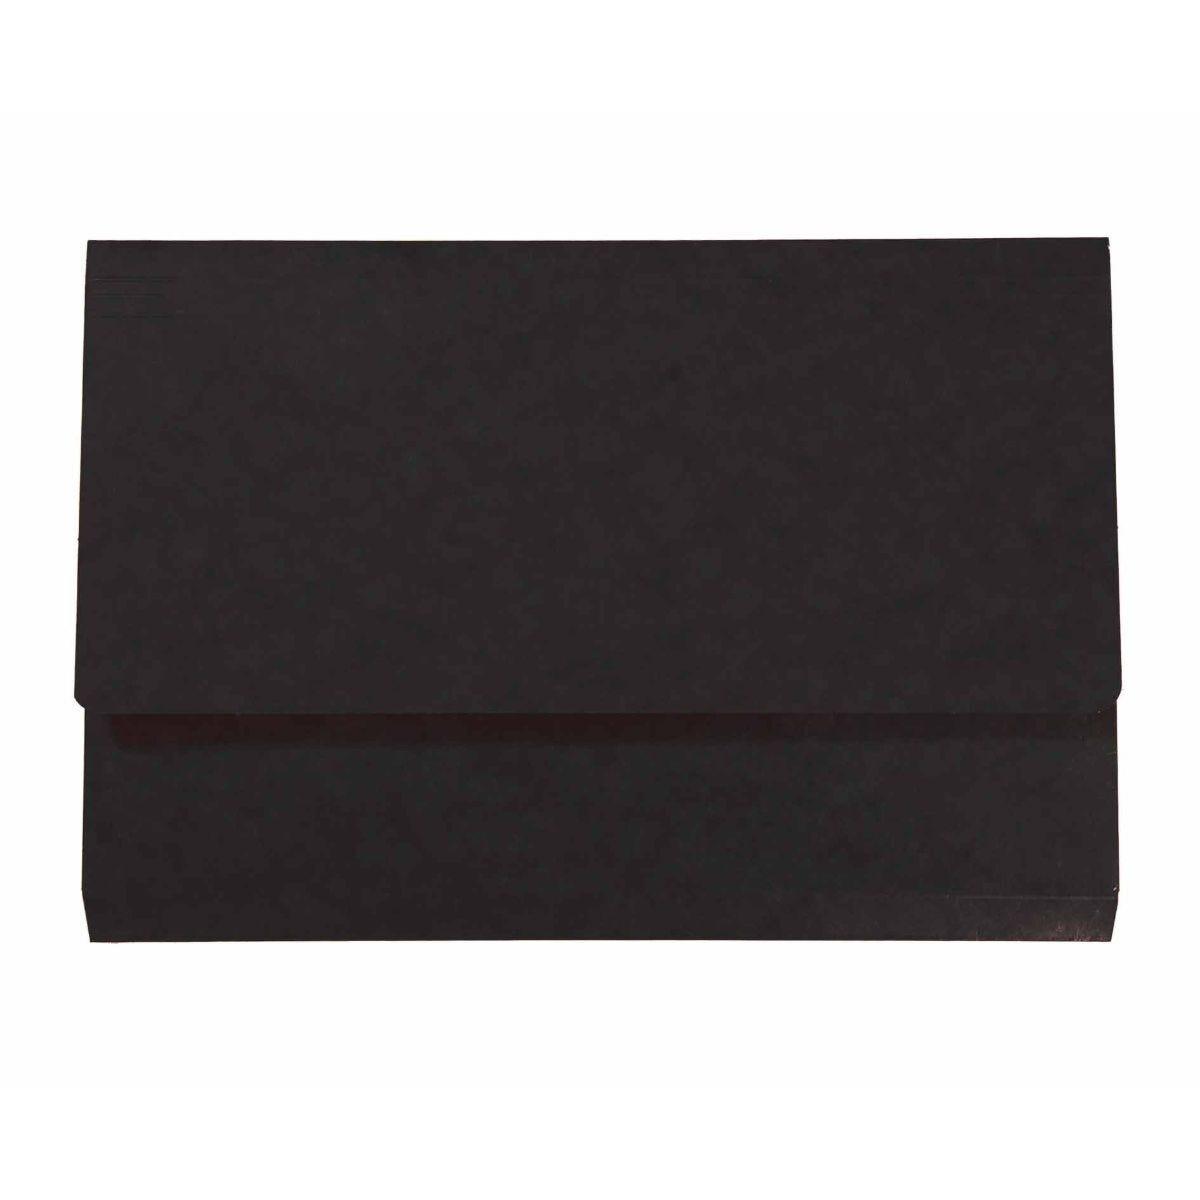 Exacompta Iderama Document Wallet Foolscap Pack of 10 265gsm Black